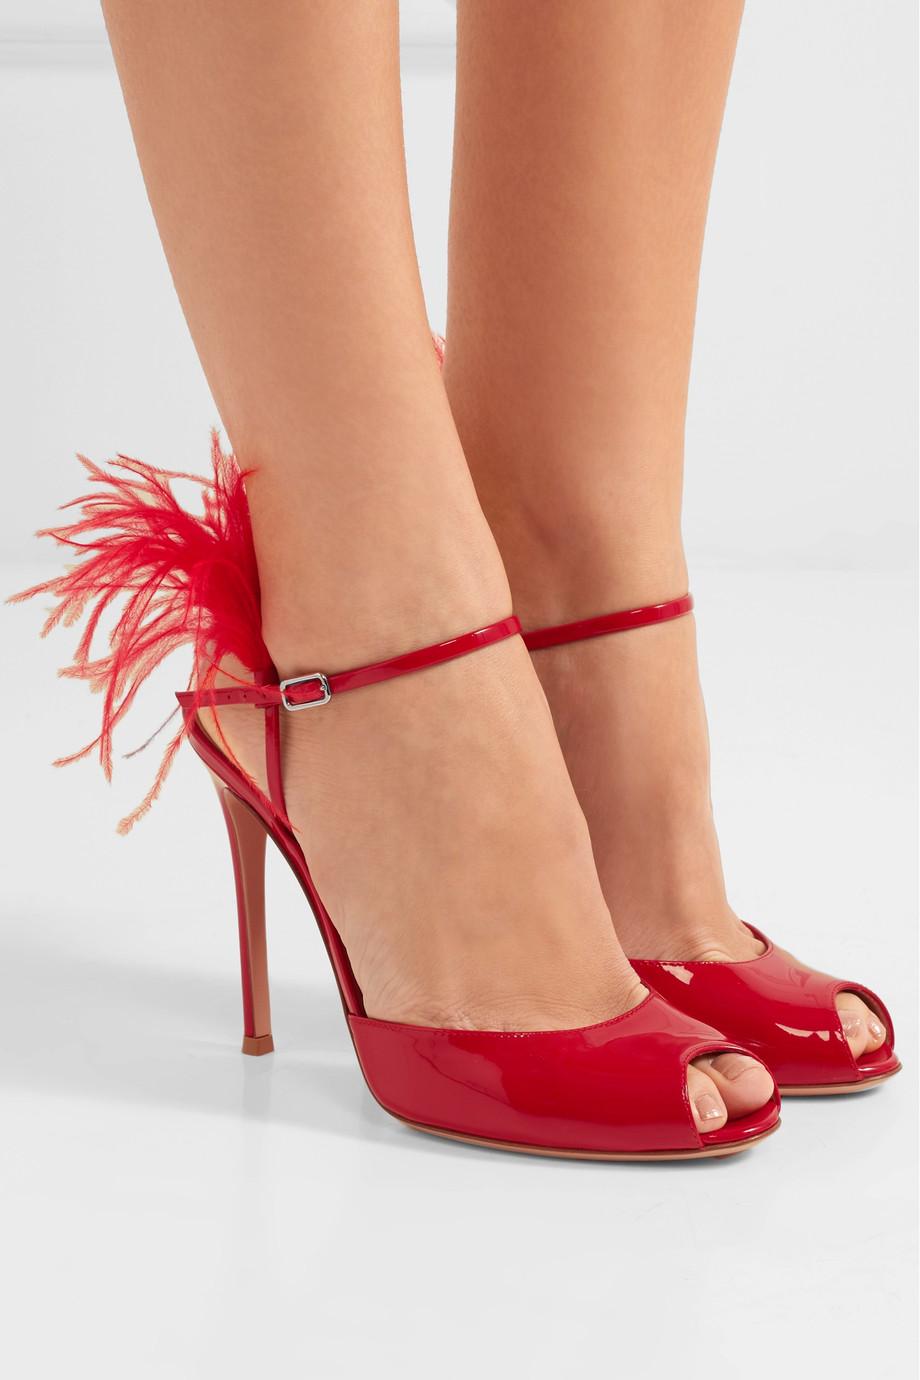 10-scarpe-rosse-con-tacco-da-avere-assolutamente-foto